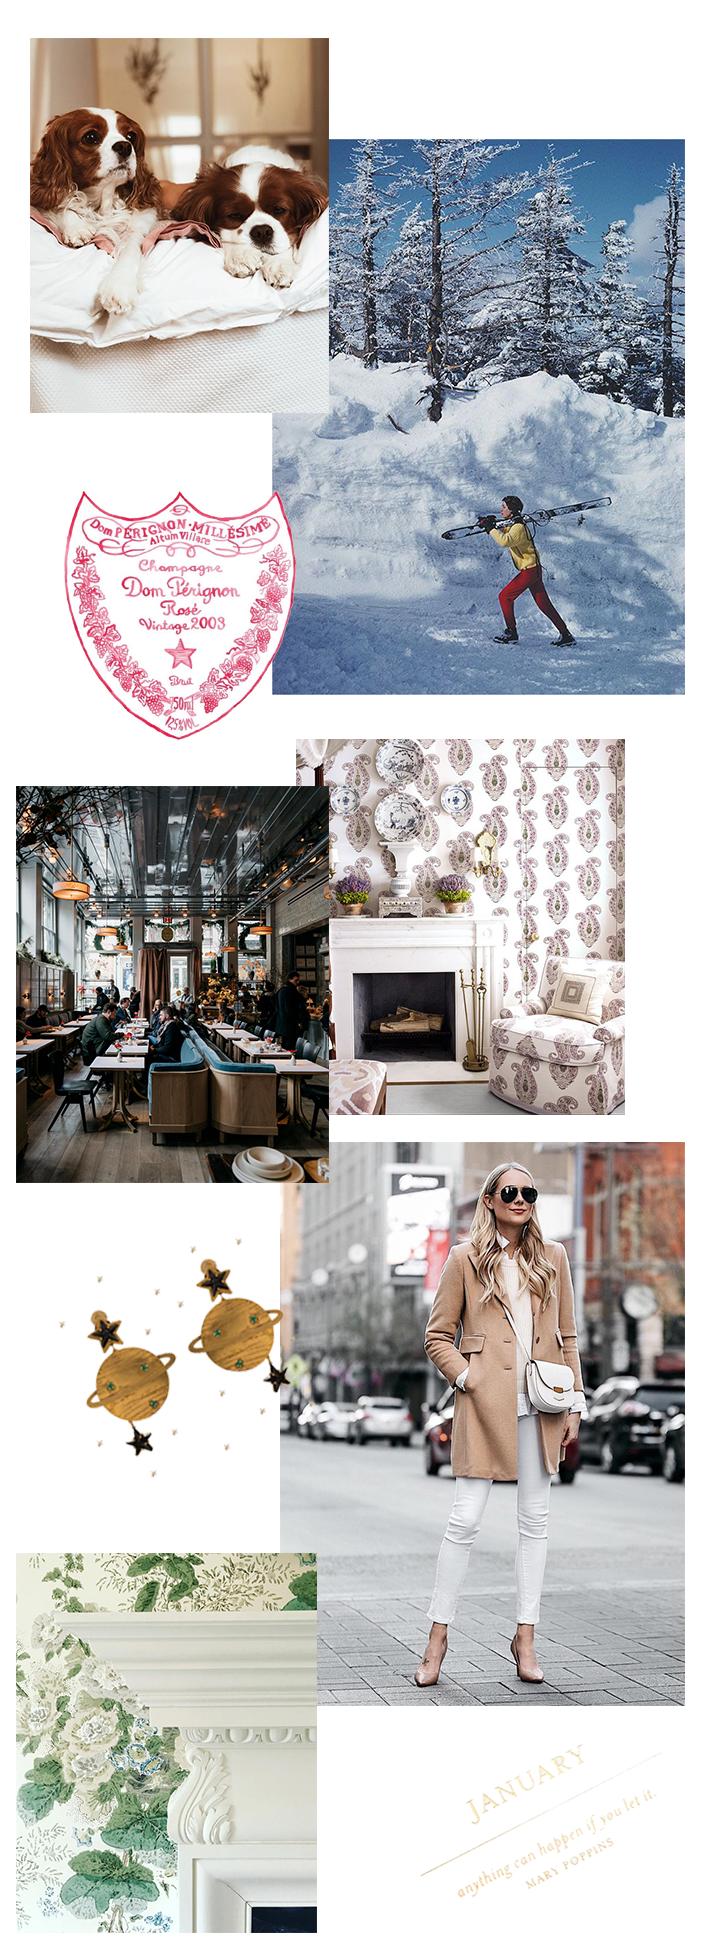 January_Lookbook_Snow_Style_Interiors